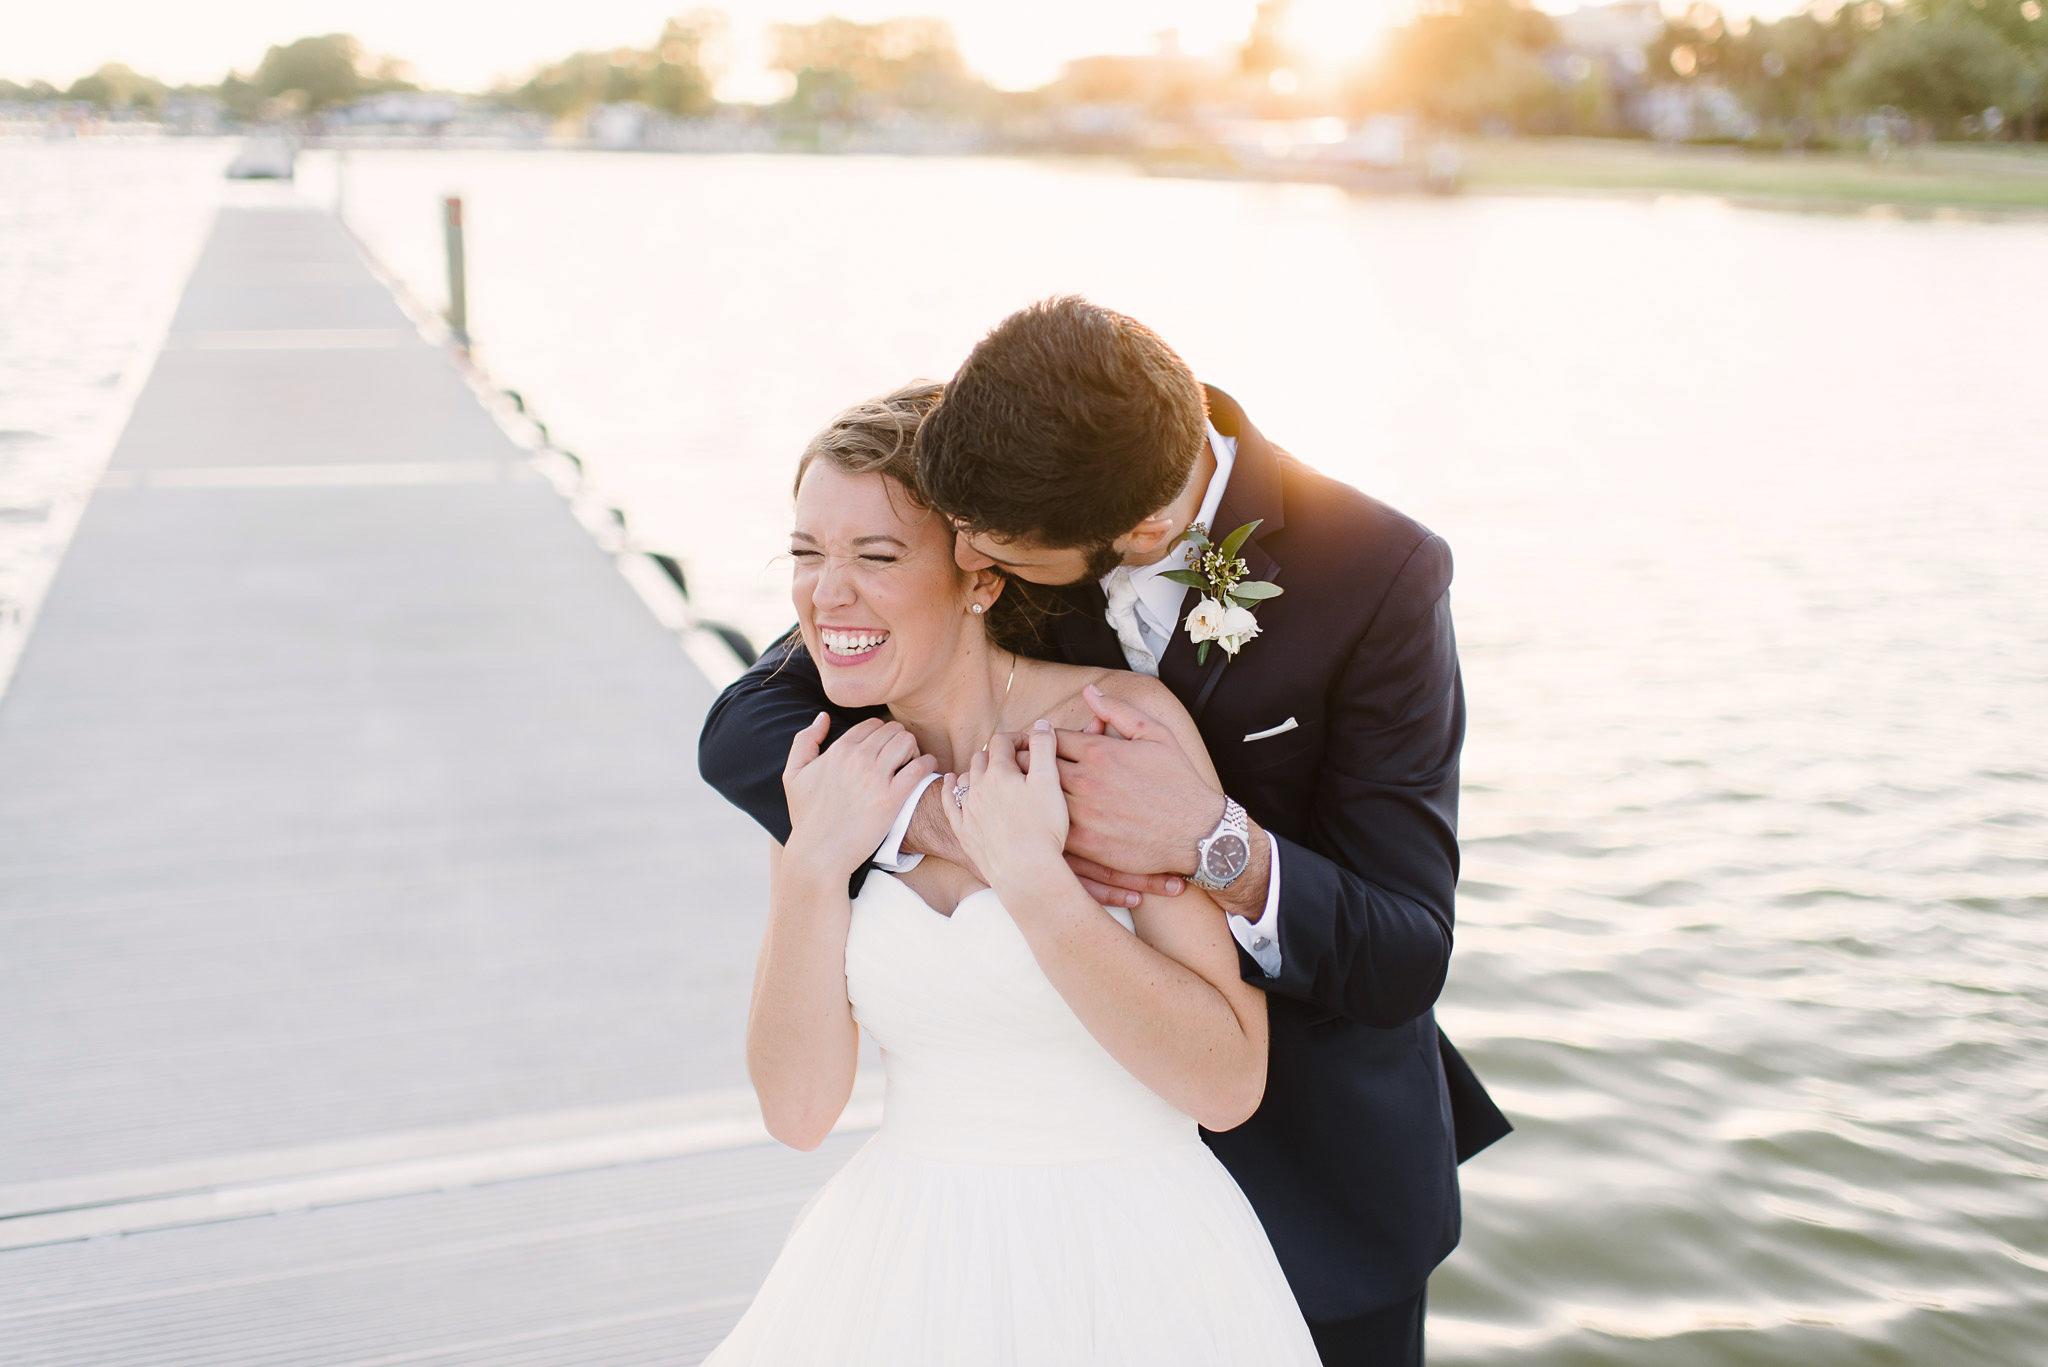 Tavares+Pavilion+on+the+Lake+Wedding+Florida_036.jpg